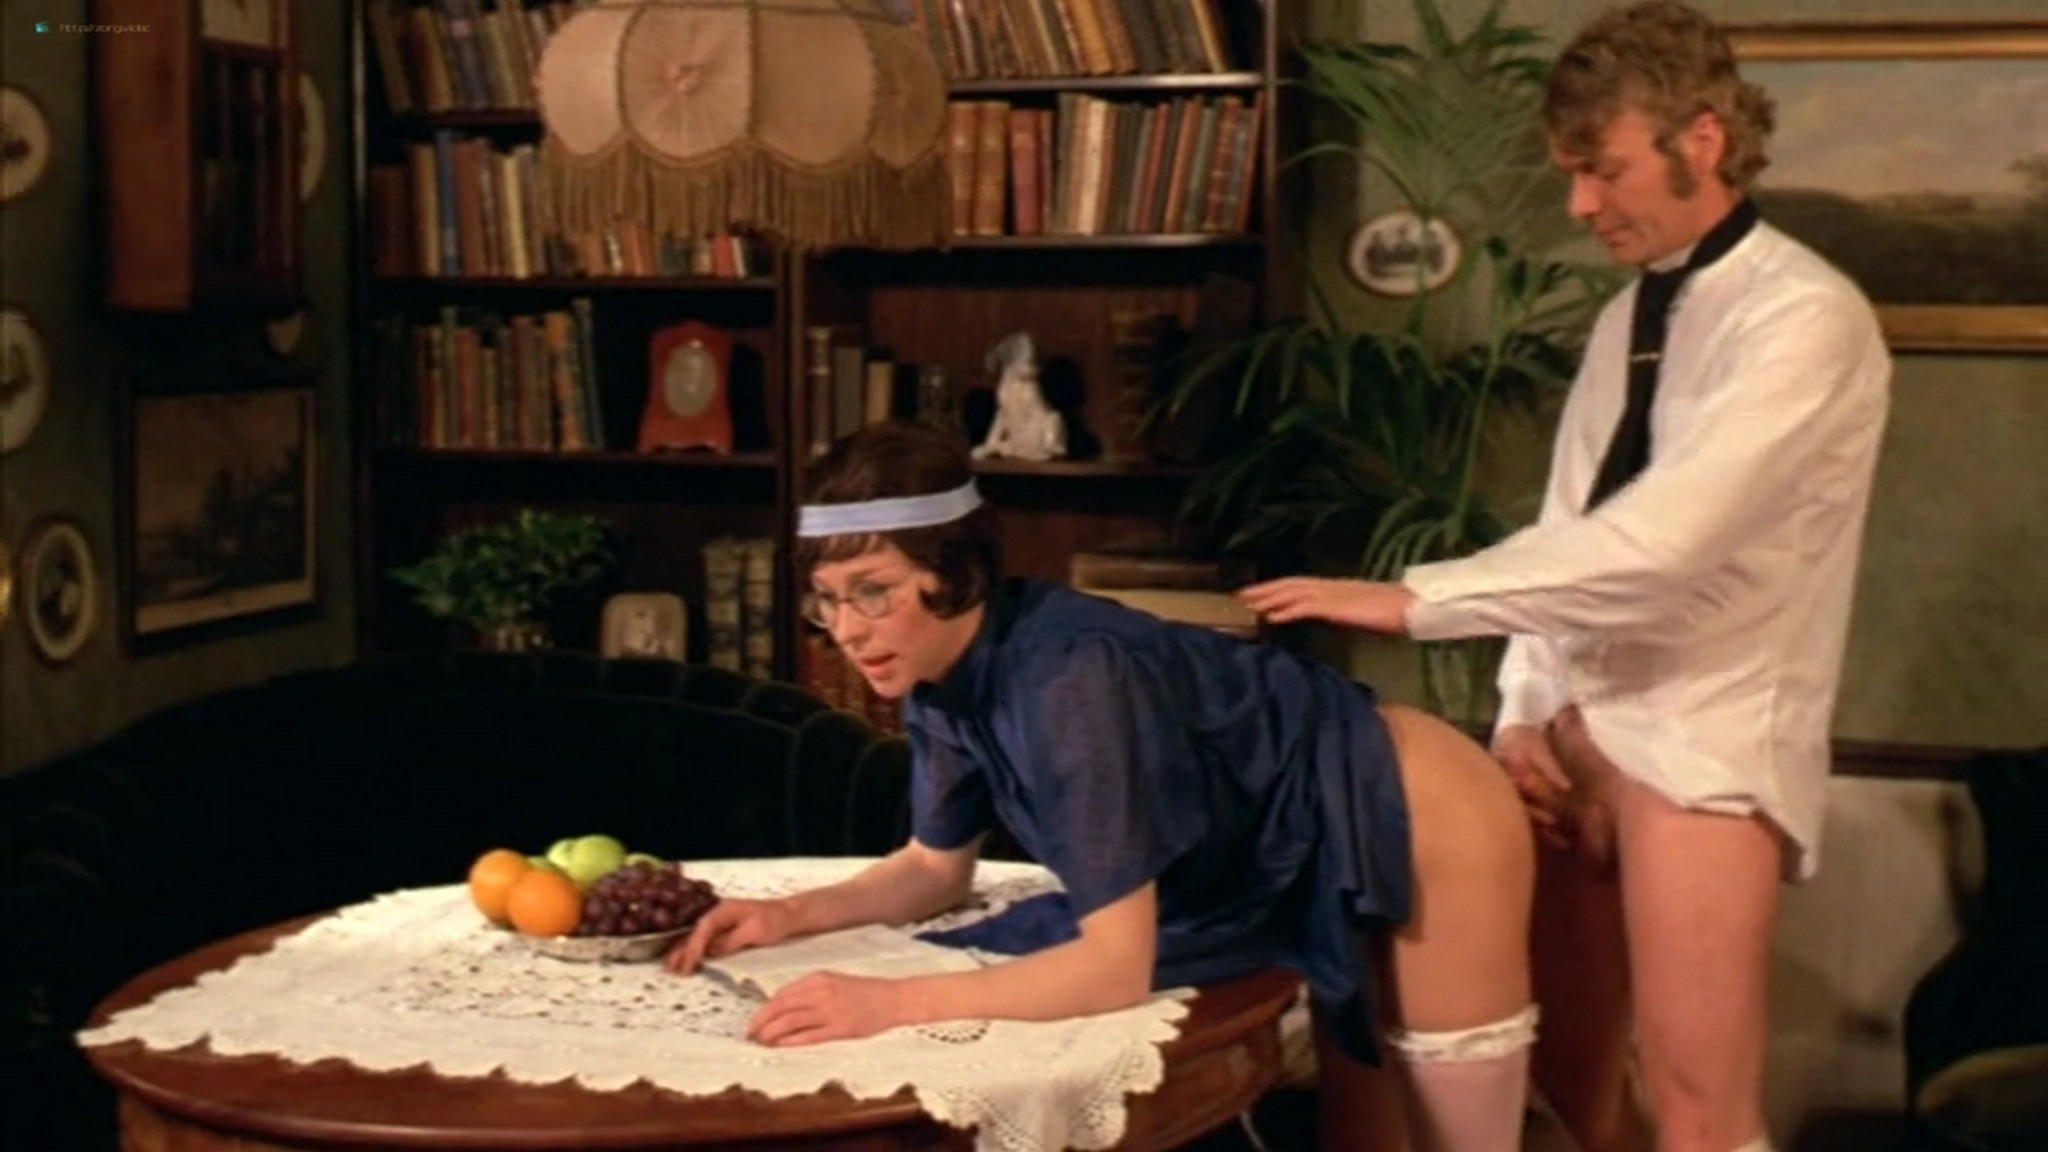 Anne Bie Warburg explicit sex Susanne Breuning and other nude sex - I tyrens tegn (DK-1974) (6)